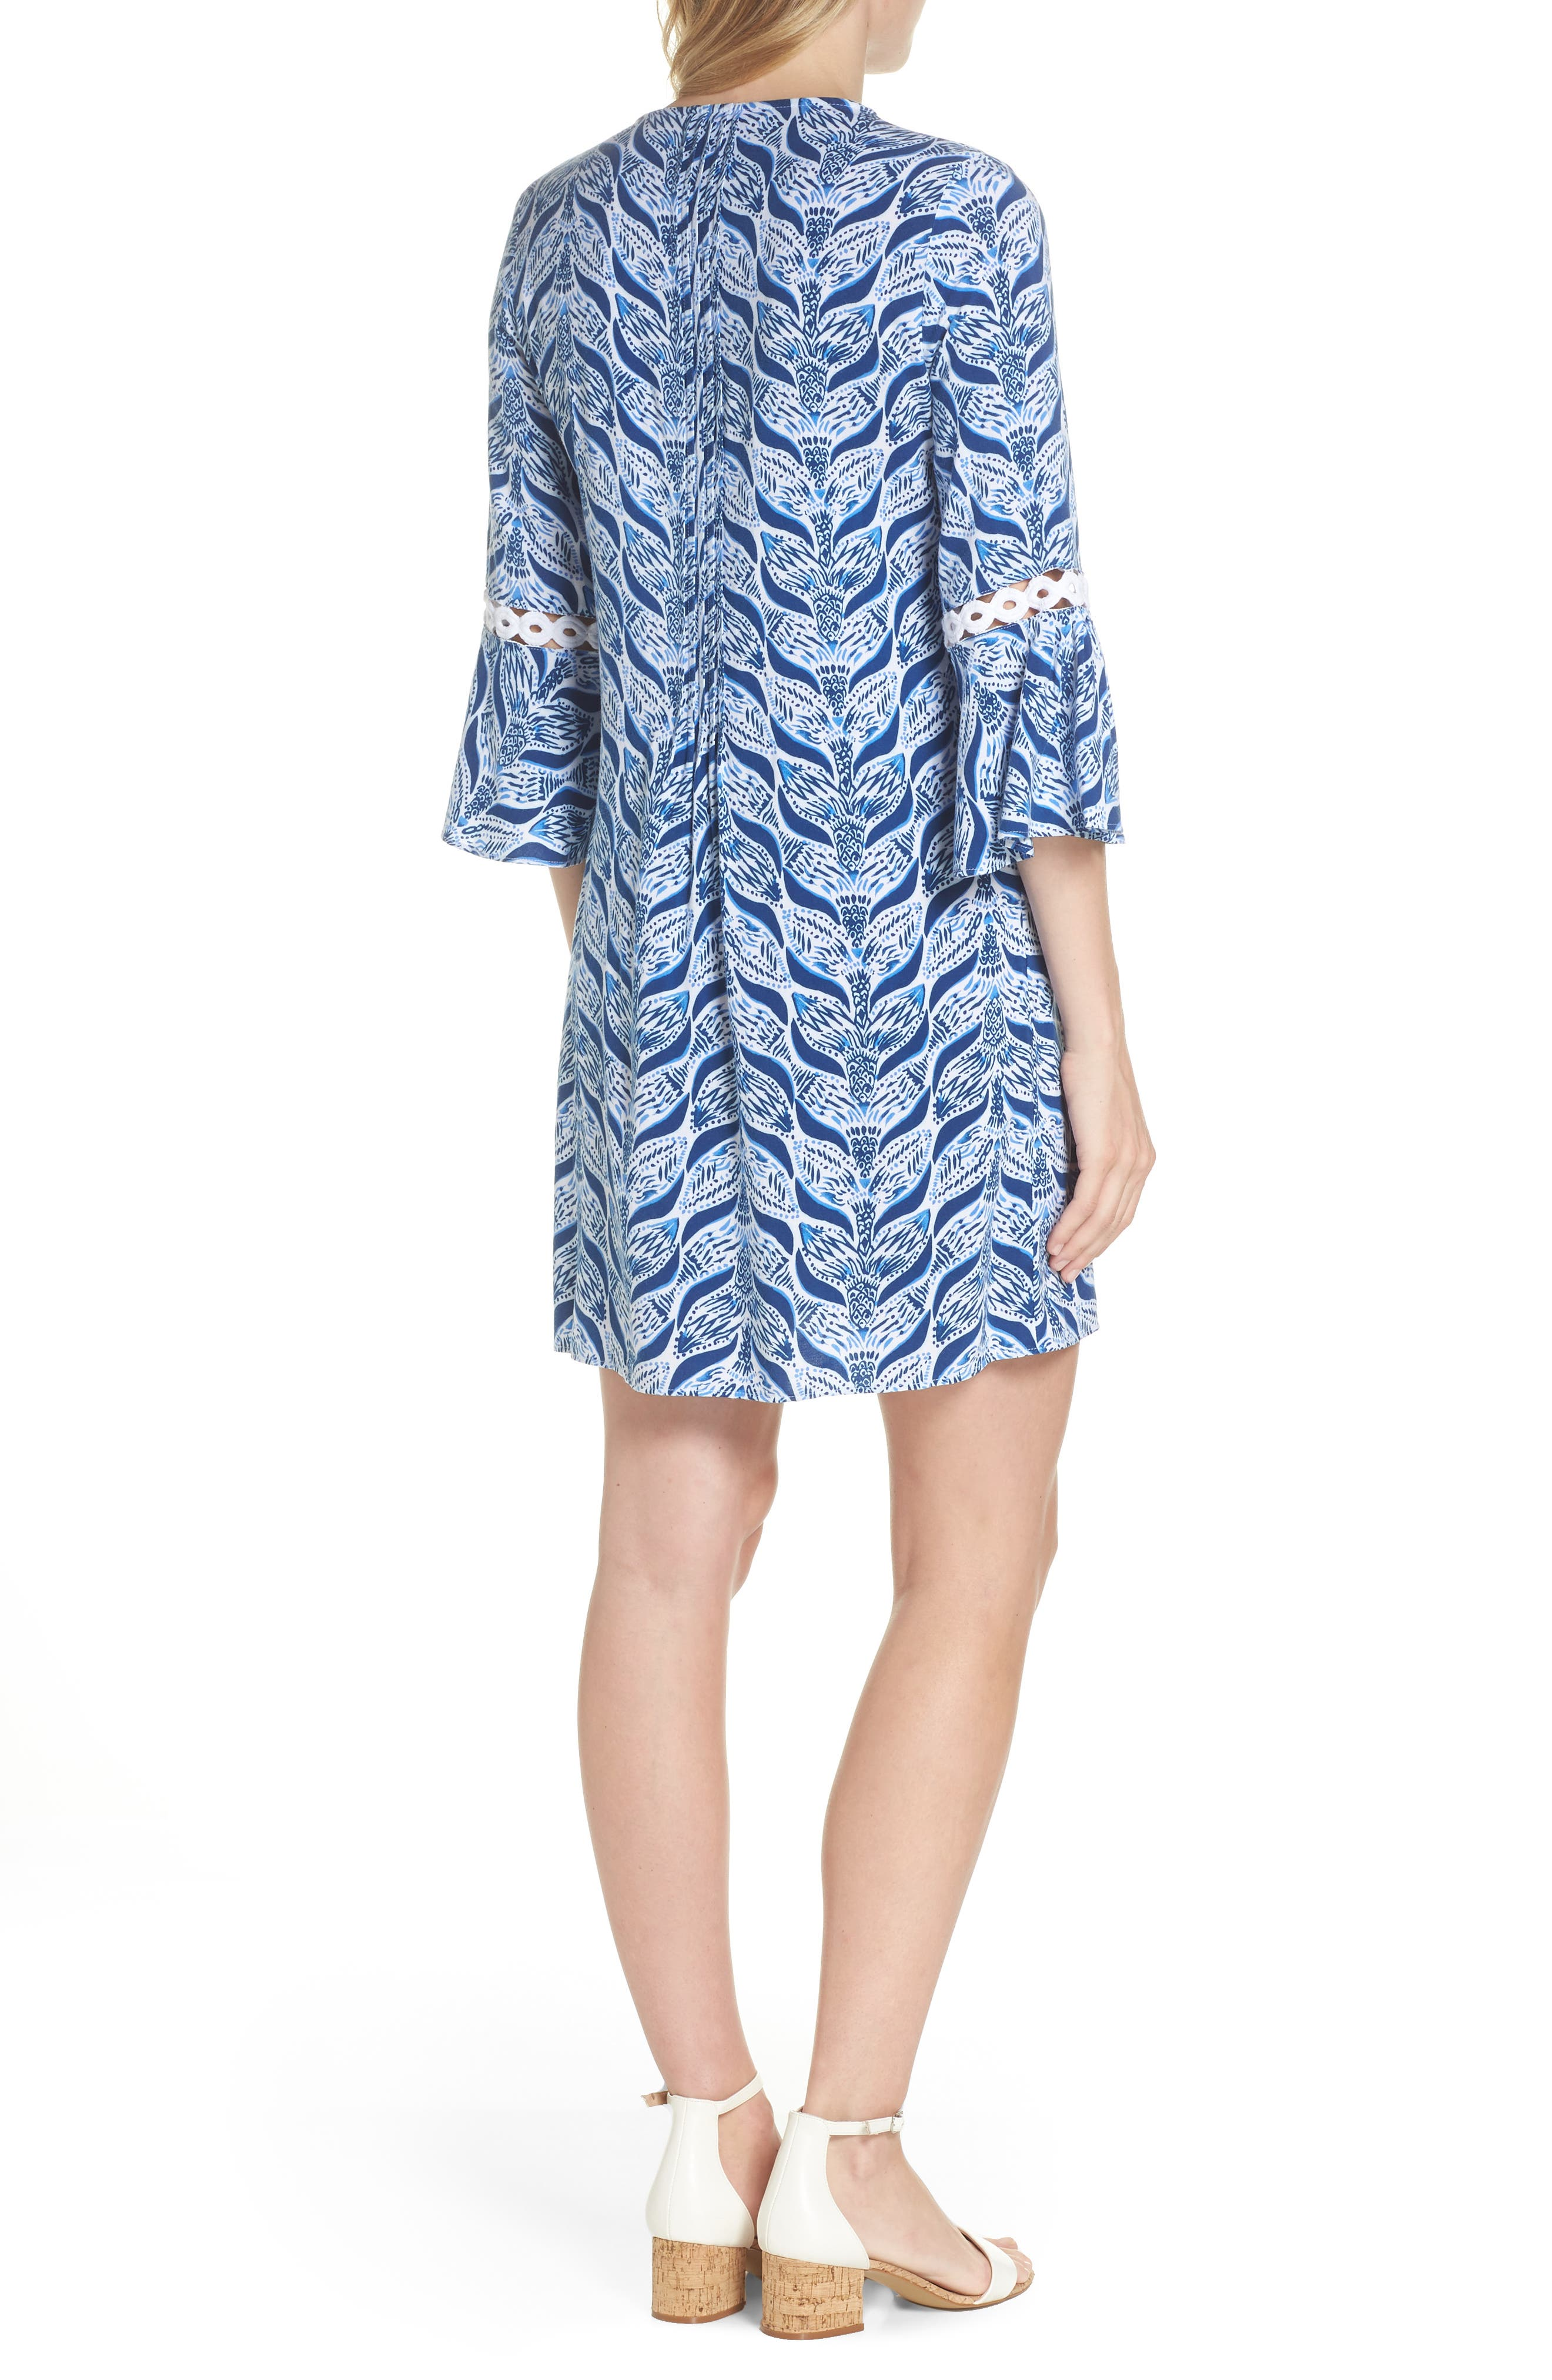 Hollie Tunic Dress,                             Alternate thumbnail 2, color,                             RESORT WHITE A MERMAIDS TAIL